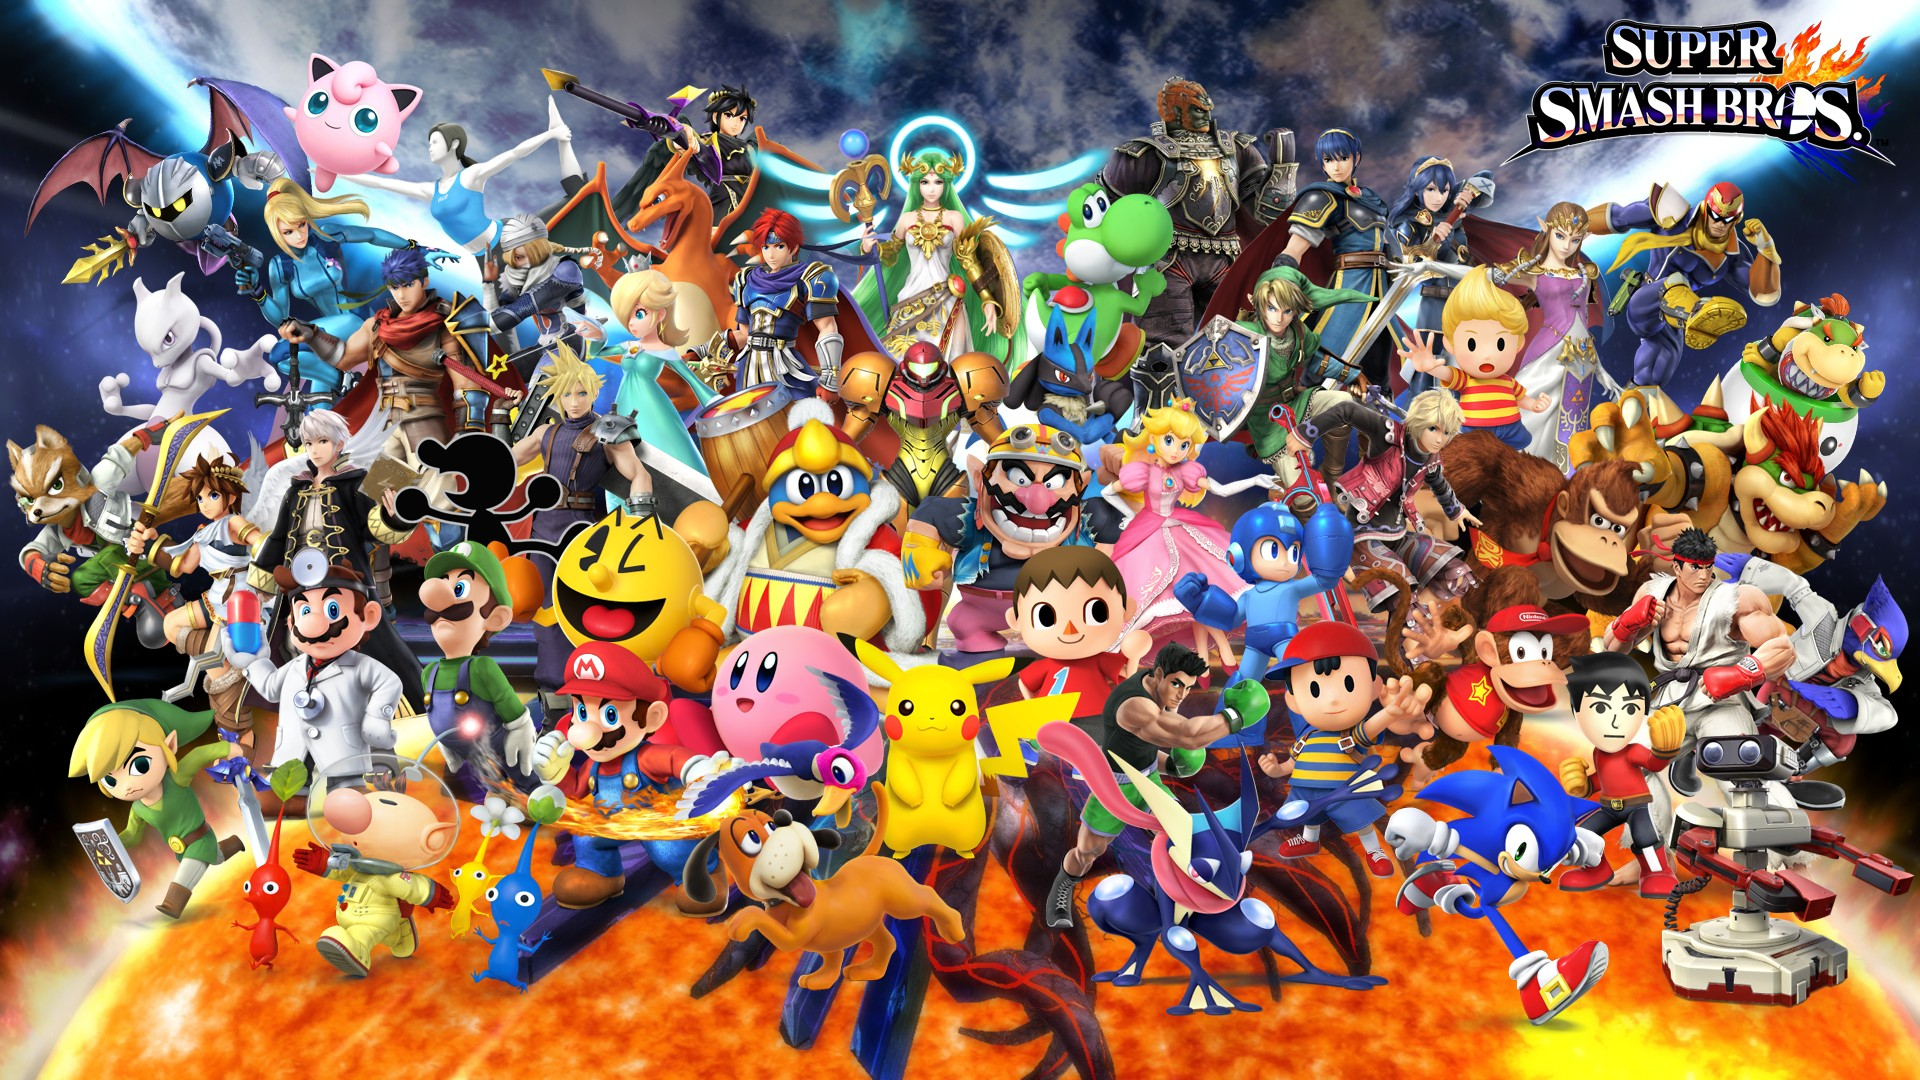 Super Smash Bros Wallpaper Download Free Beautiful Wallpapers